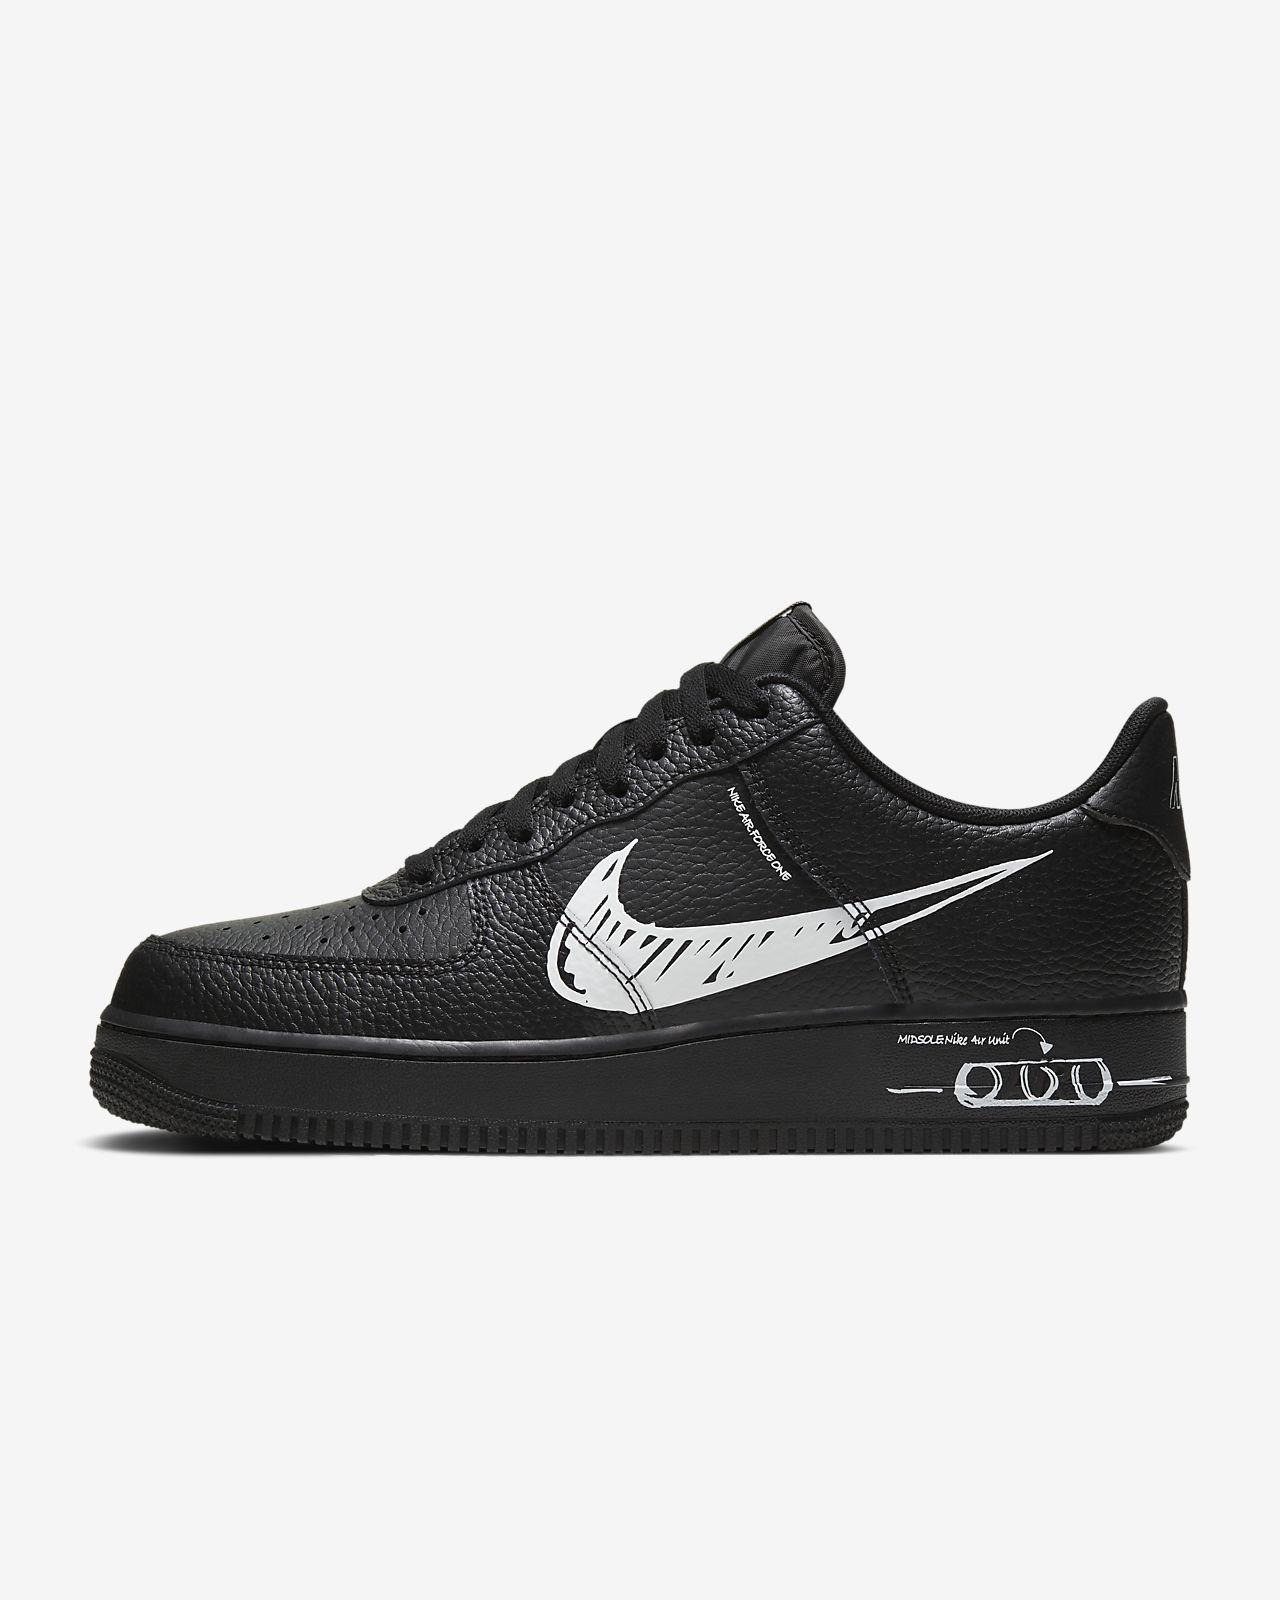 Мужские кроссовки Nike Air Force 1 LV8 Utility